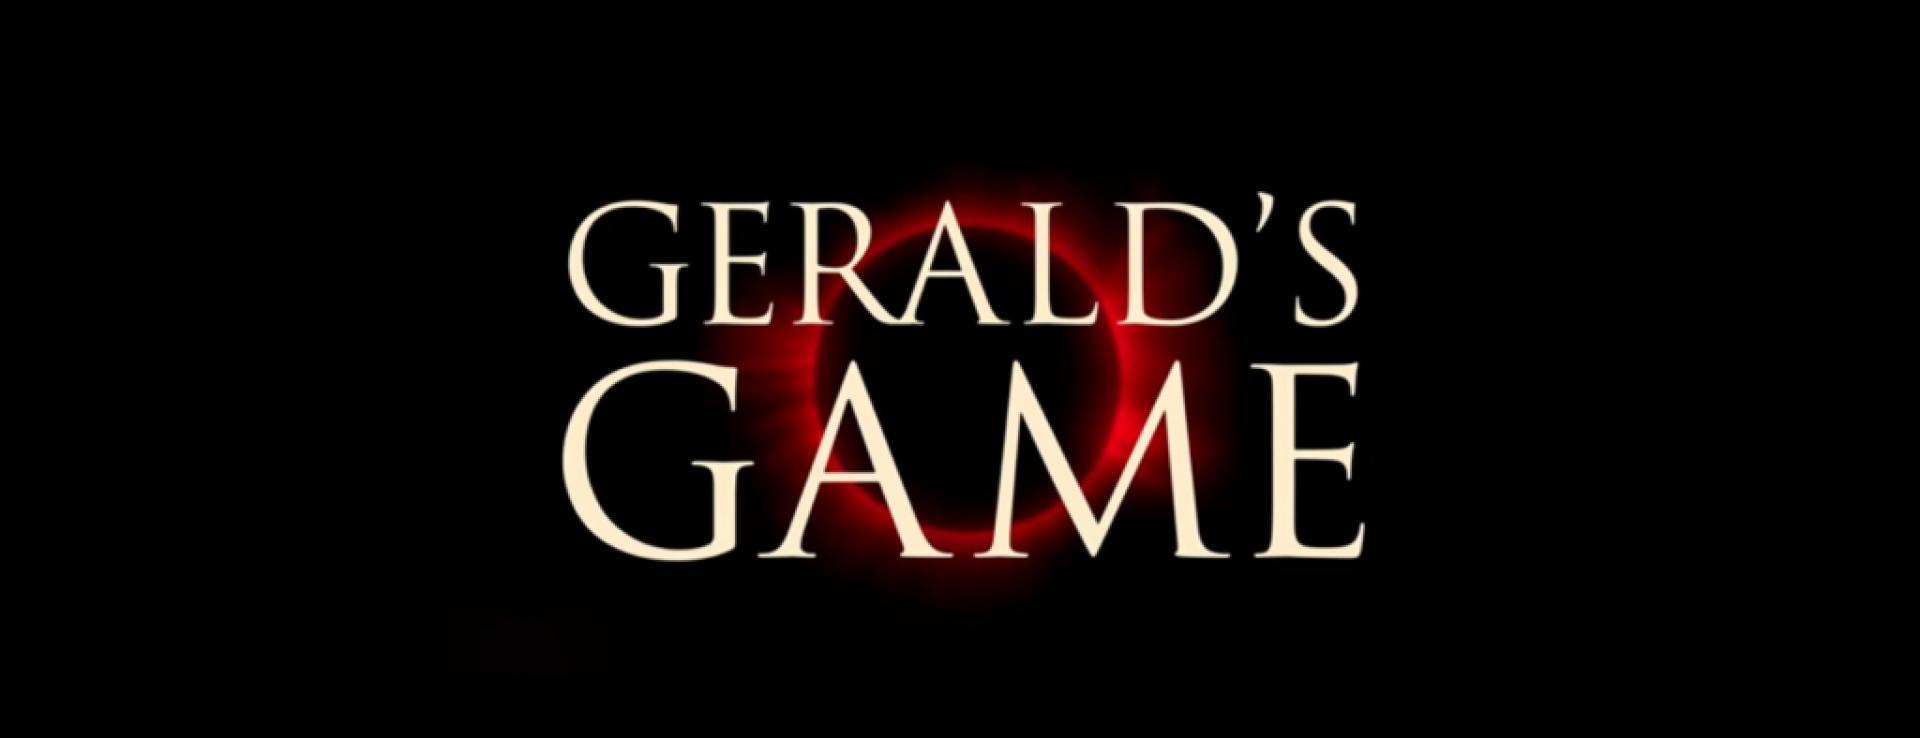 Gerald's Game - Bilincsben (2017)